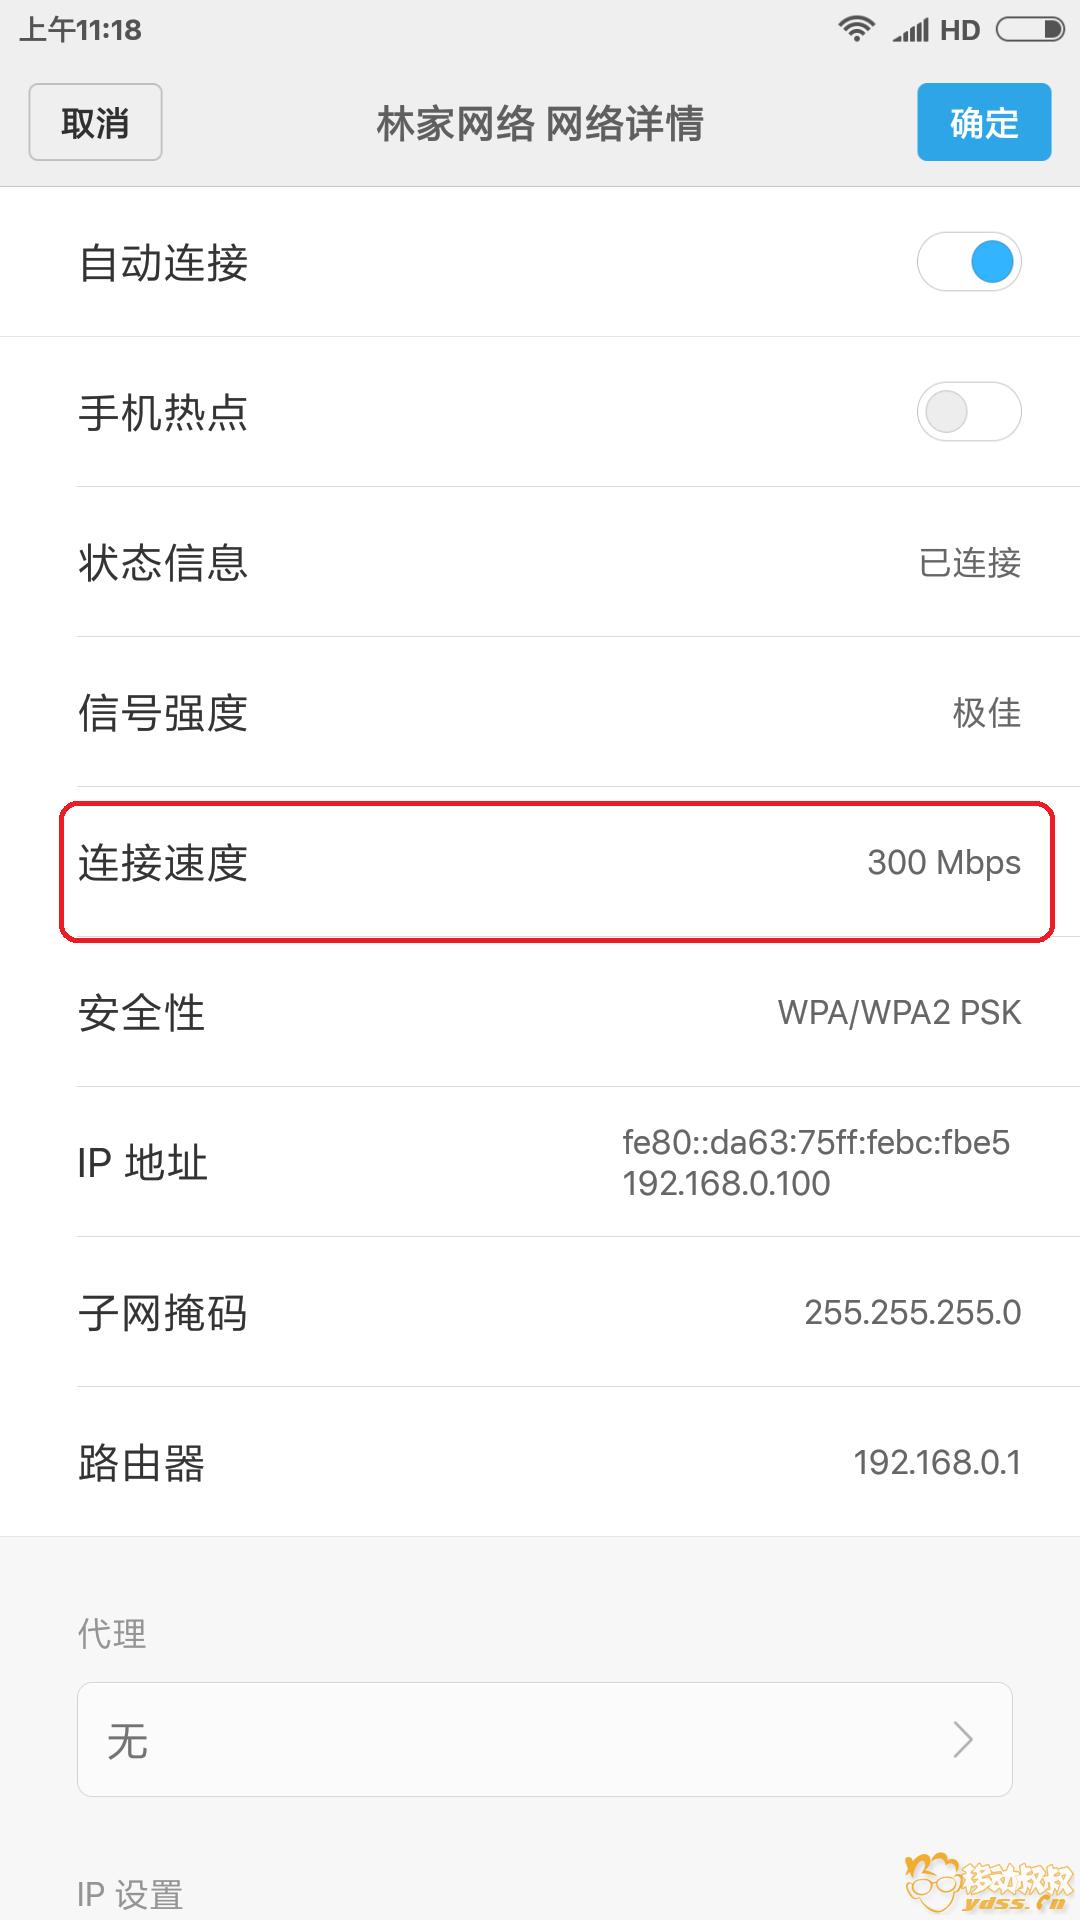 Screenshot_2018-05-04-11-18-11-759_com.android.settings.png